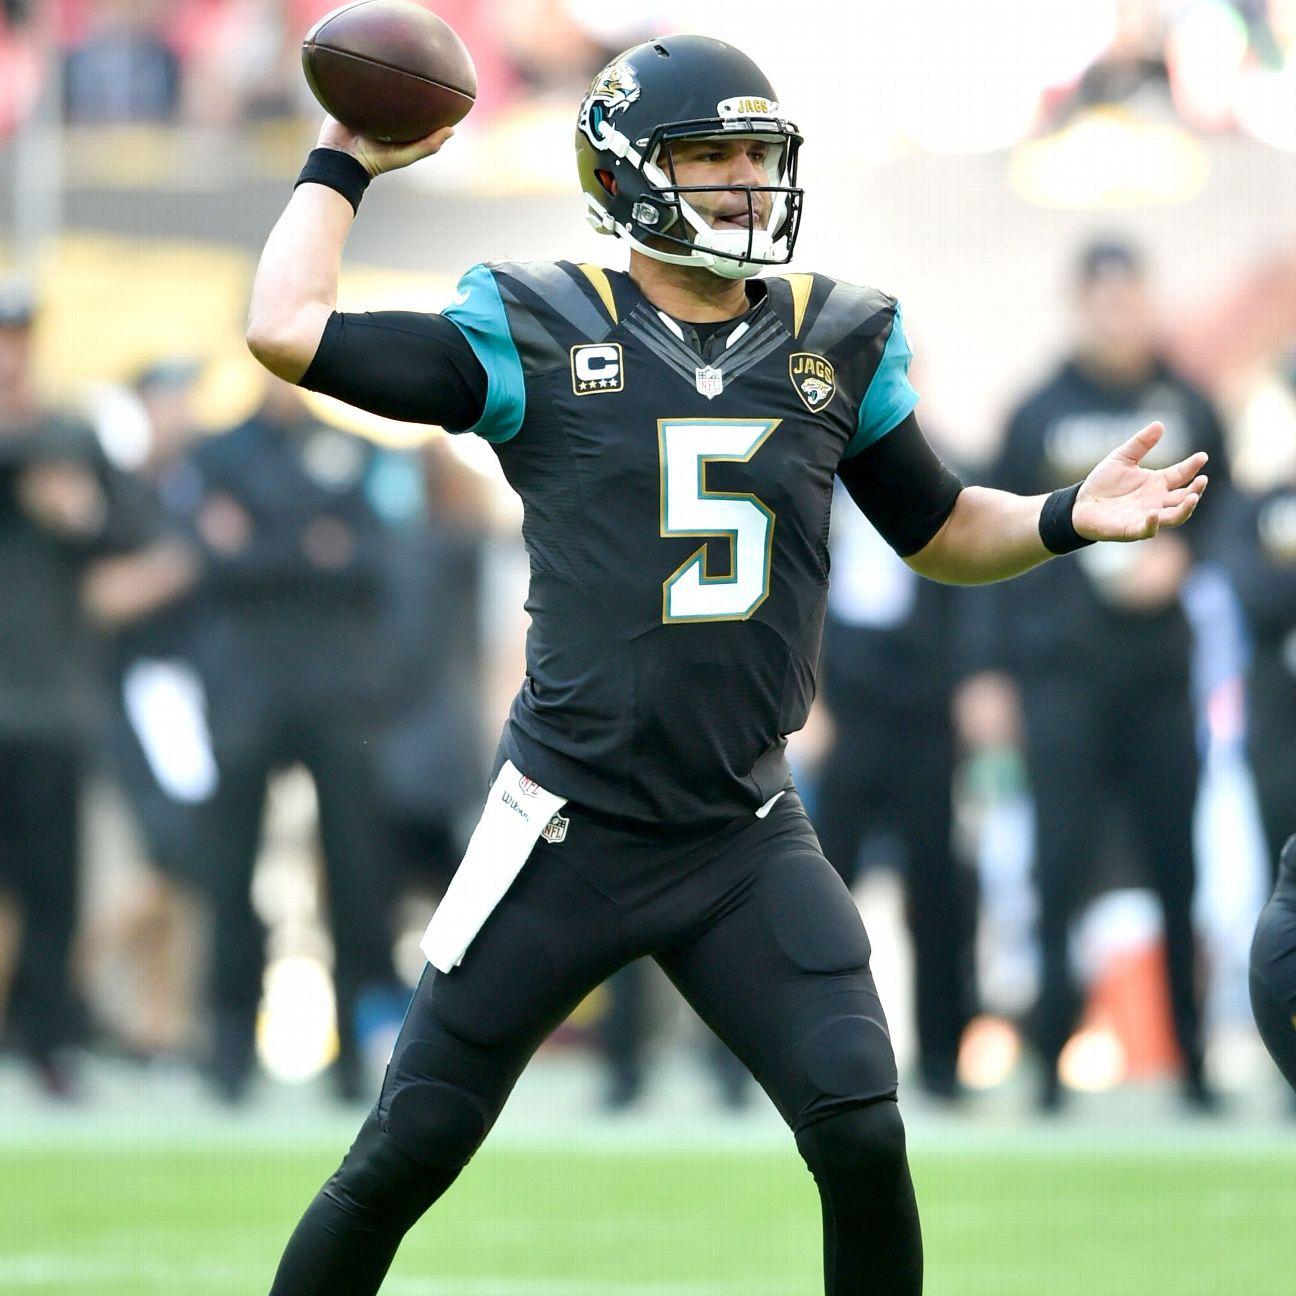 Jacksonville Jaguars Qb Blake Bortles Getting Help With